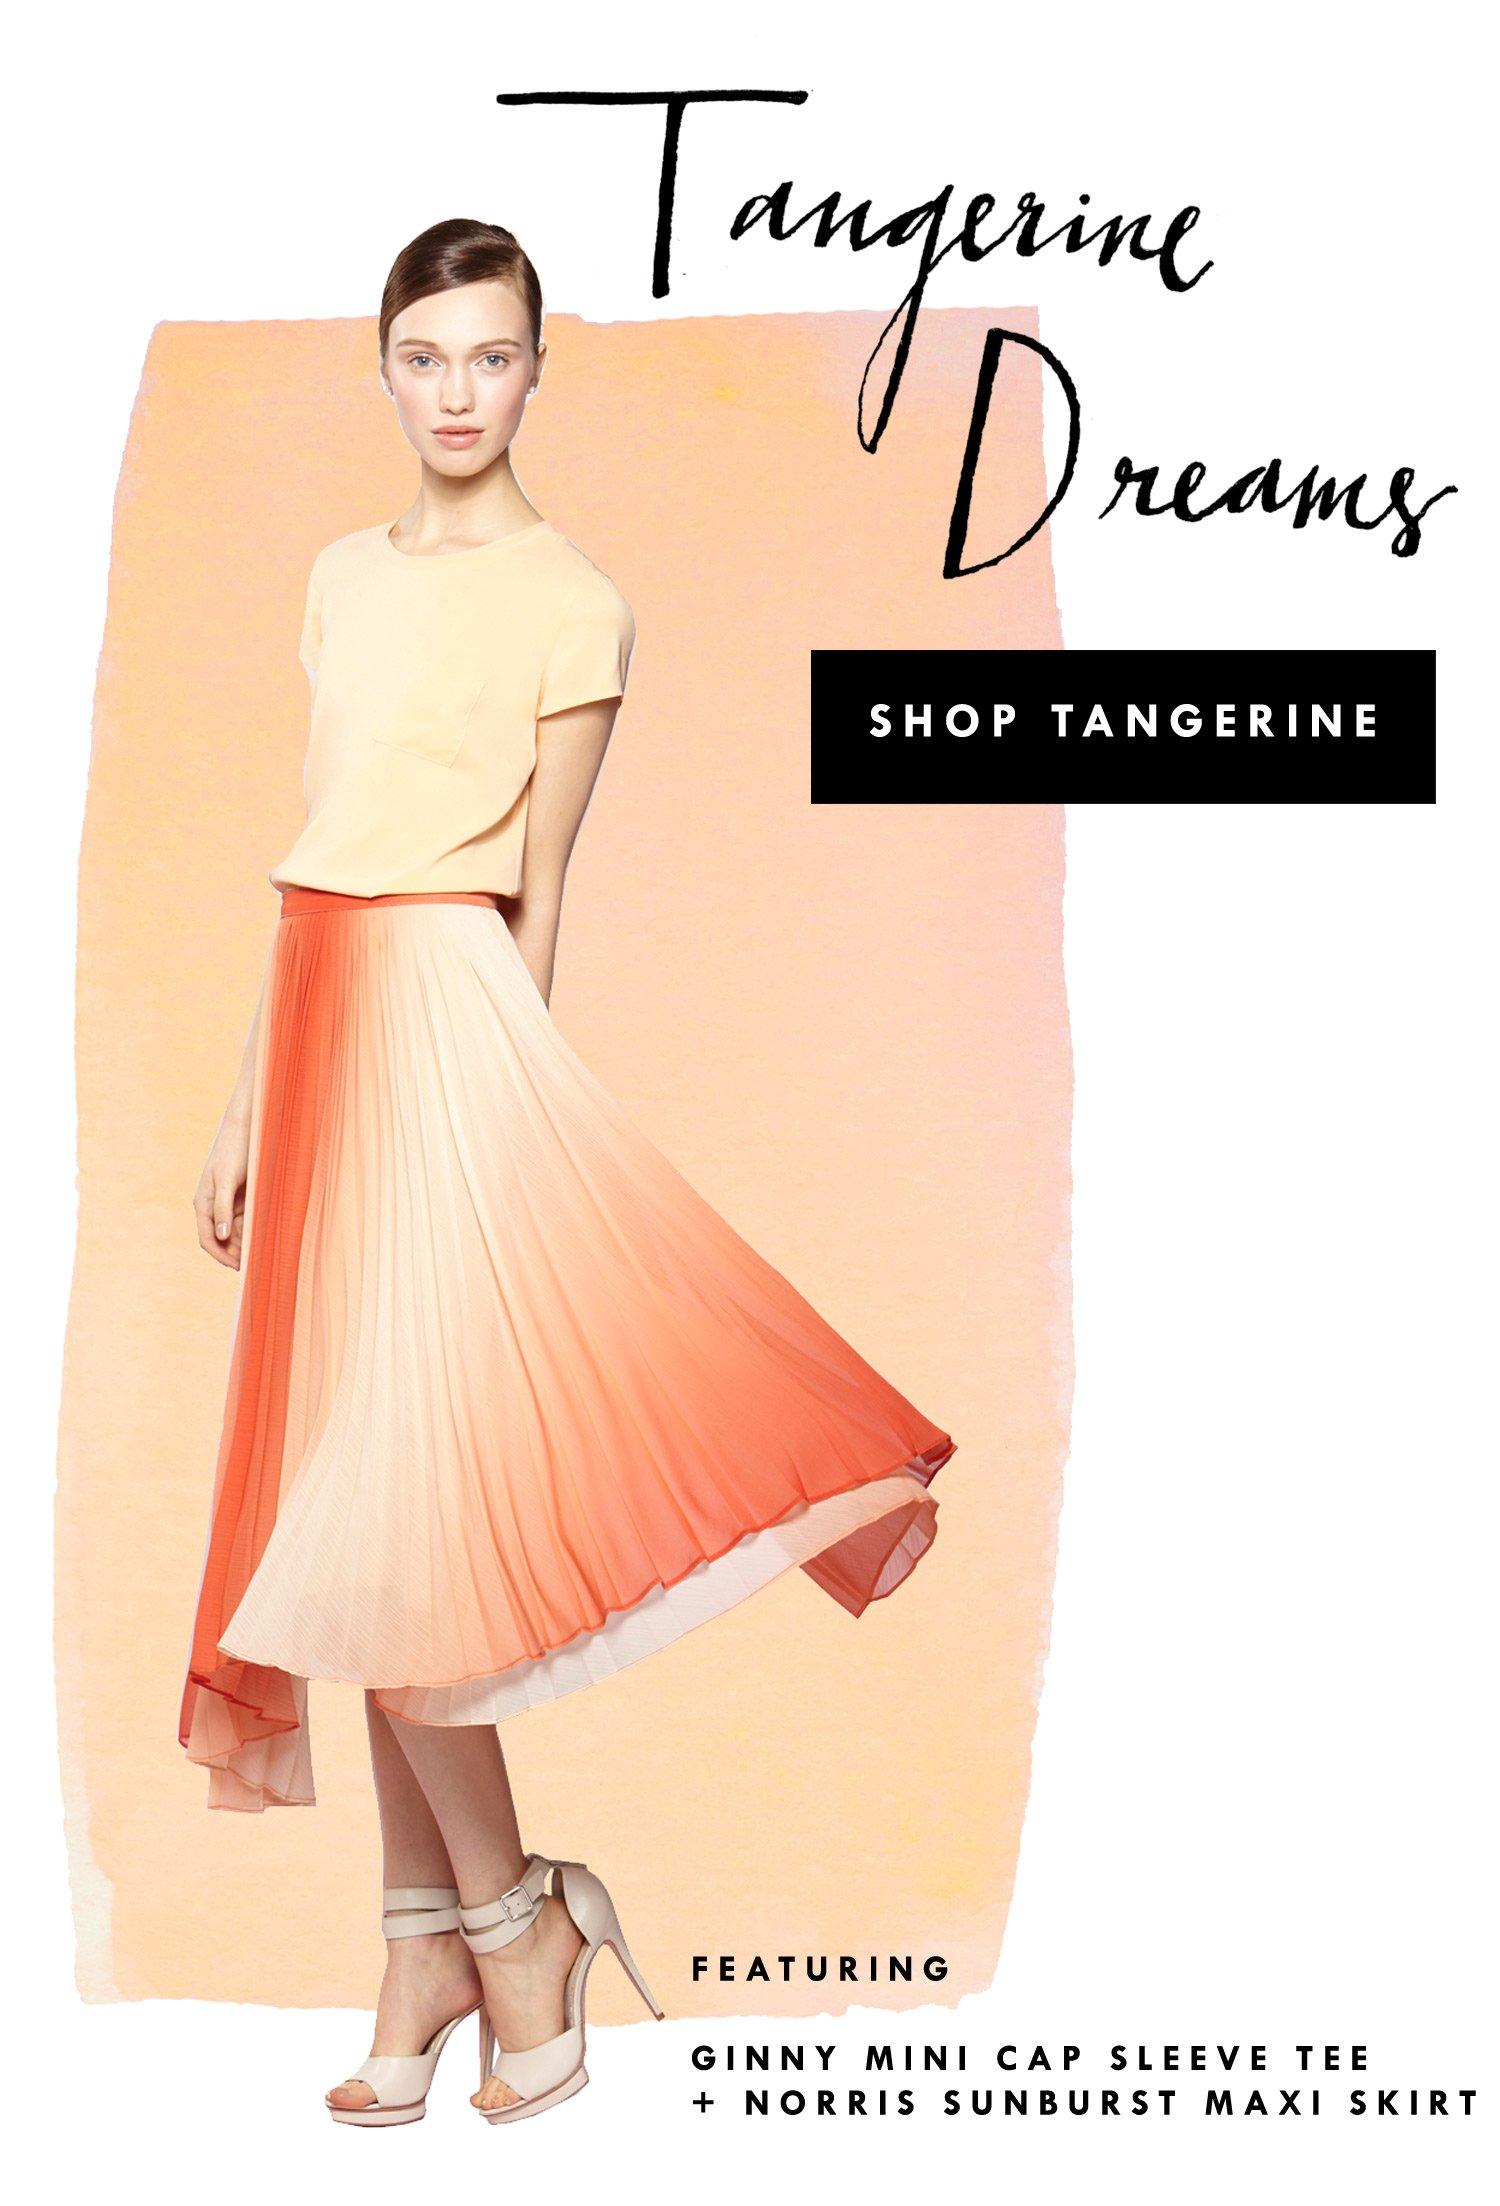 Shop Tangerine Dream